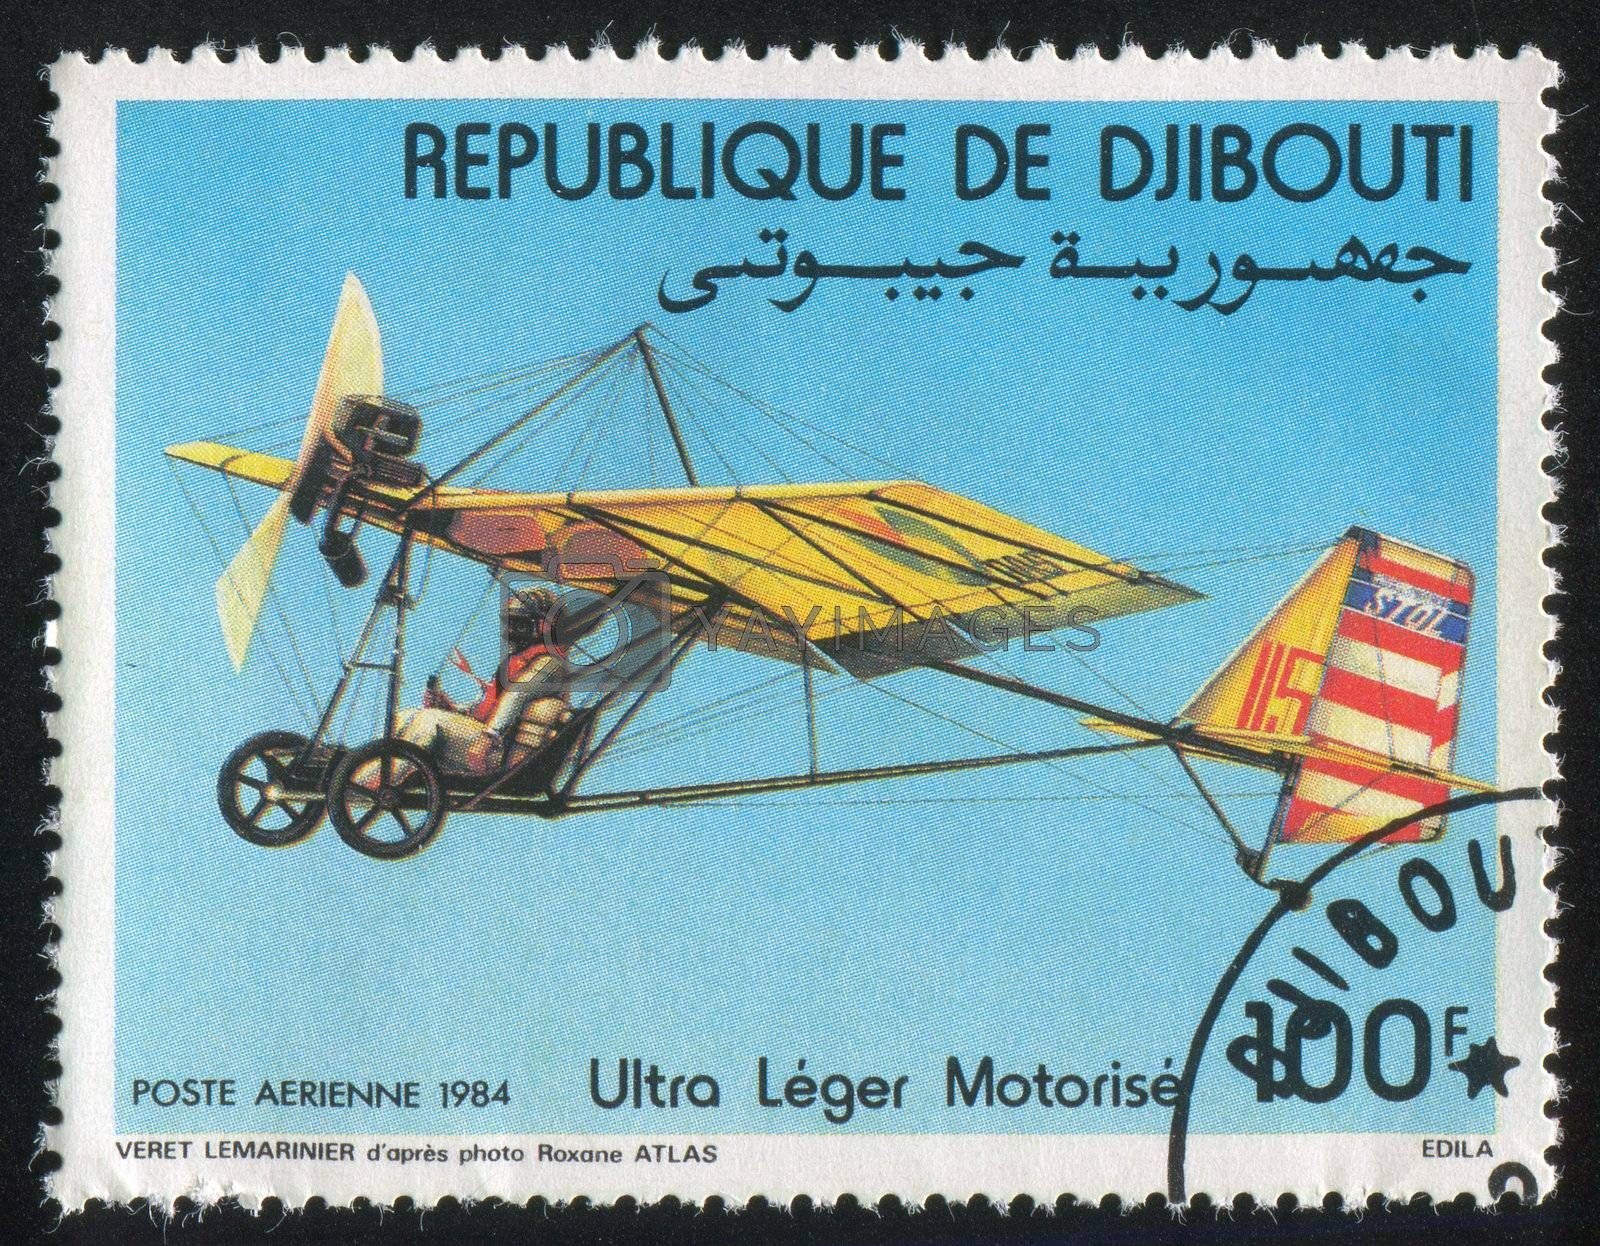 DJIBOUTI - CIRCA 1984: stamp printed by Djibouti, shows Motorized Hang Gliders, circa 1984